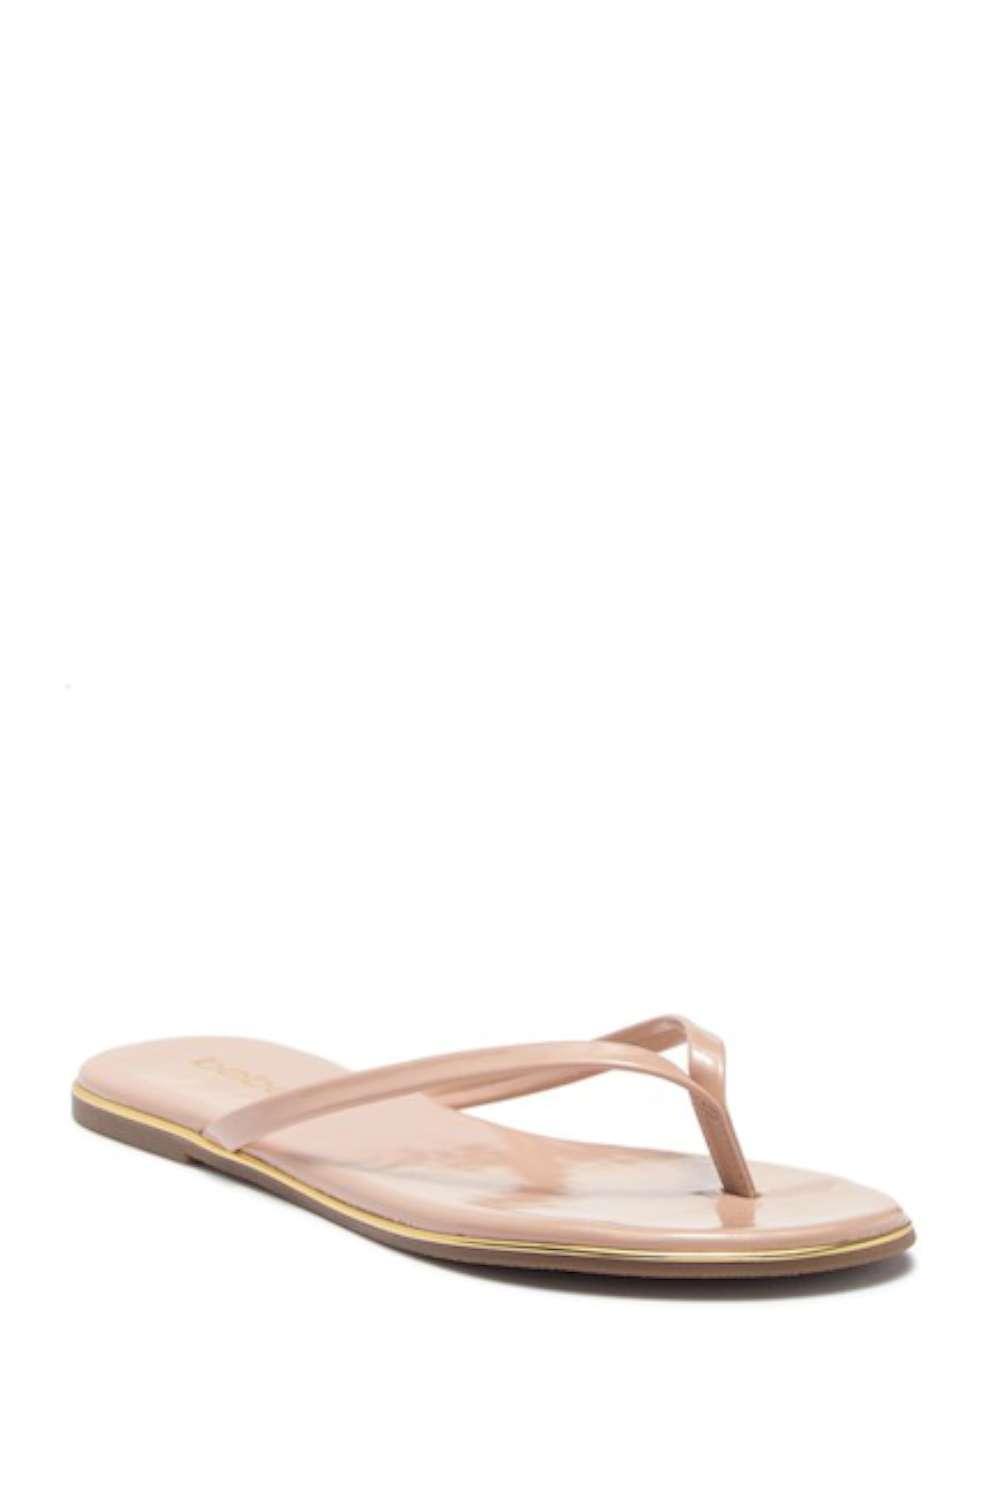 8363b0a4f Bebe Womens Ilistra Open Toe Casual Slide Sandals